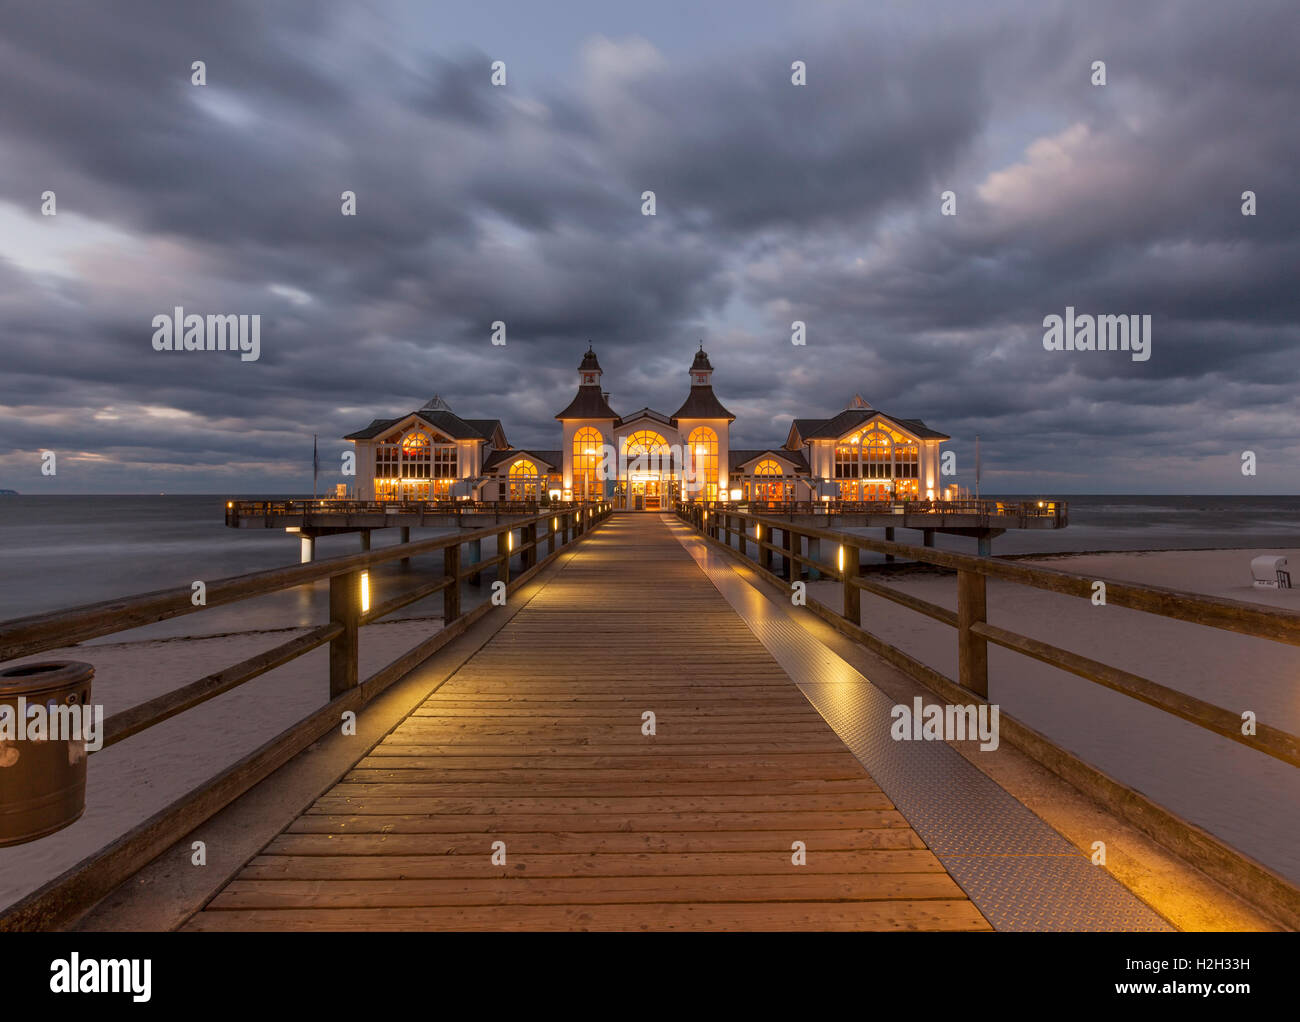 Illuminated historic pier at Ostseebad Sellin, Ruegen, Germany, at night, long exposure - Stock Image